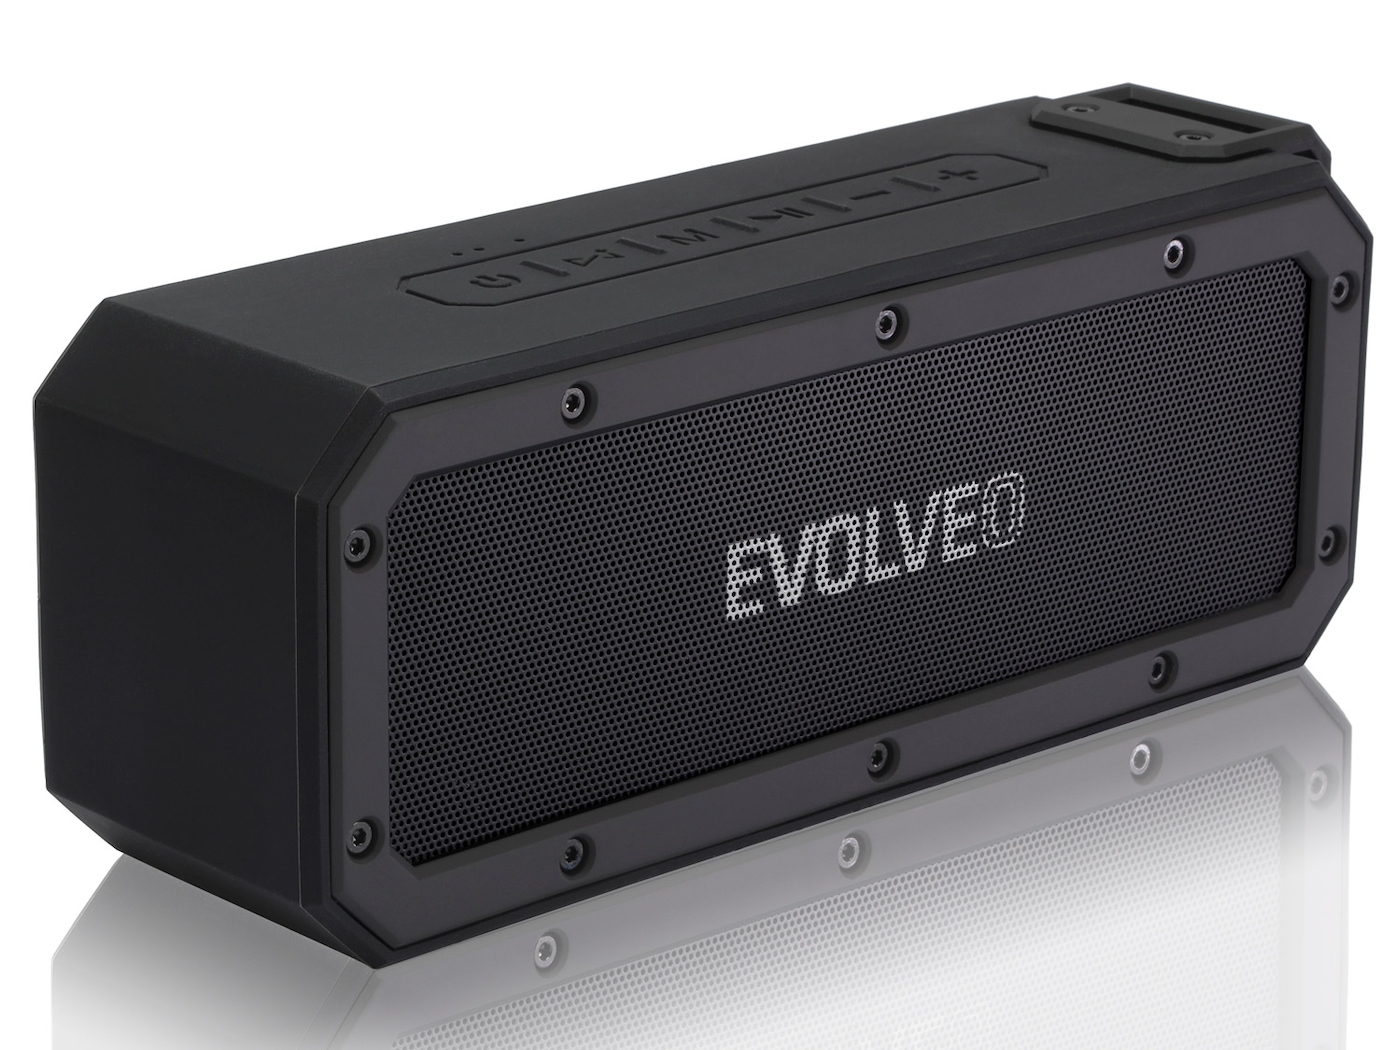 EVOLVEO_ARMOR_O5_front